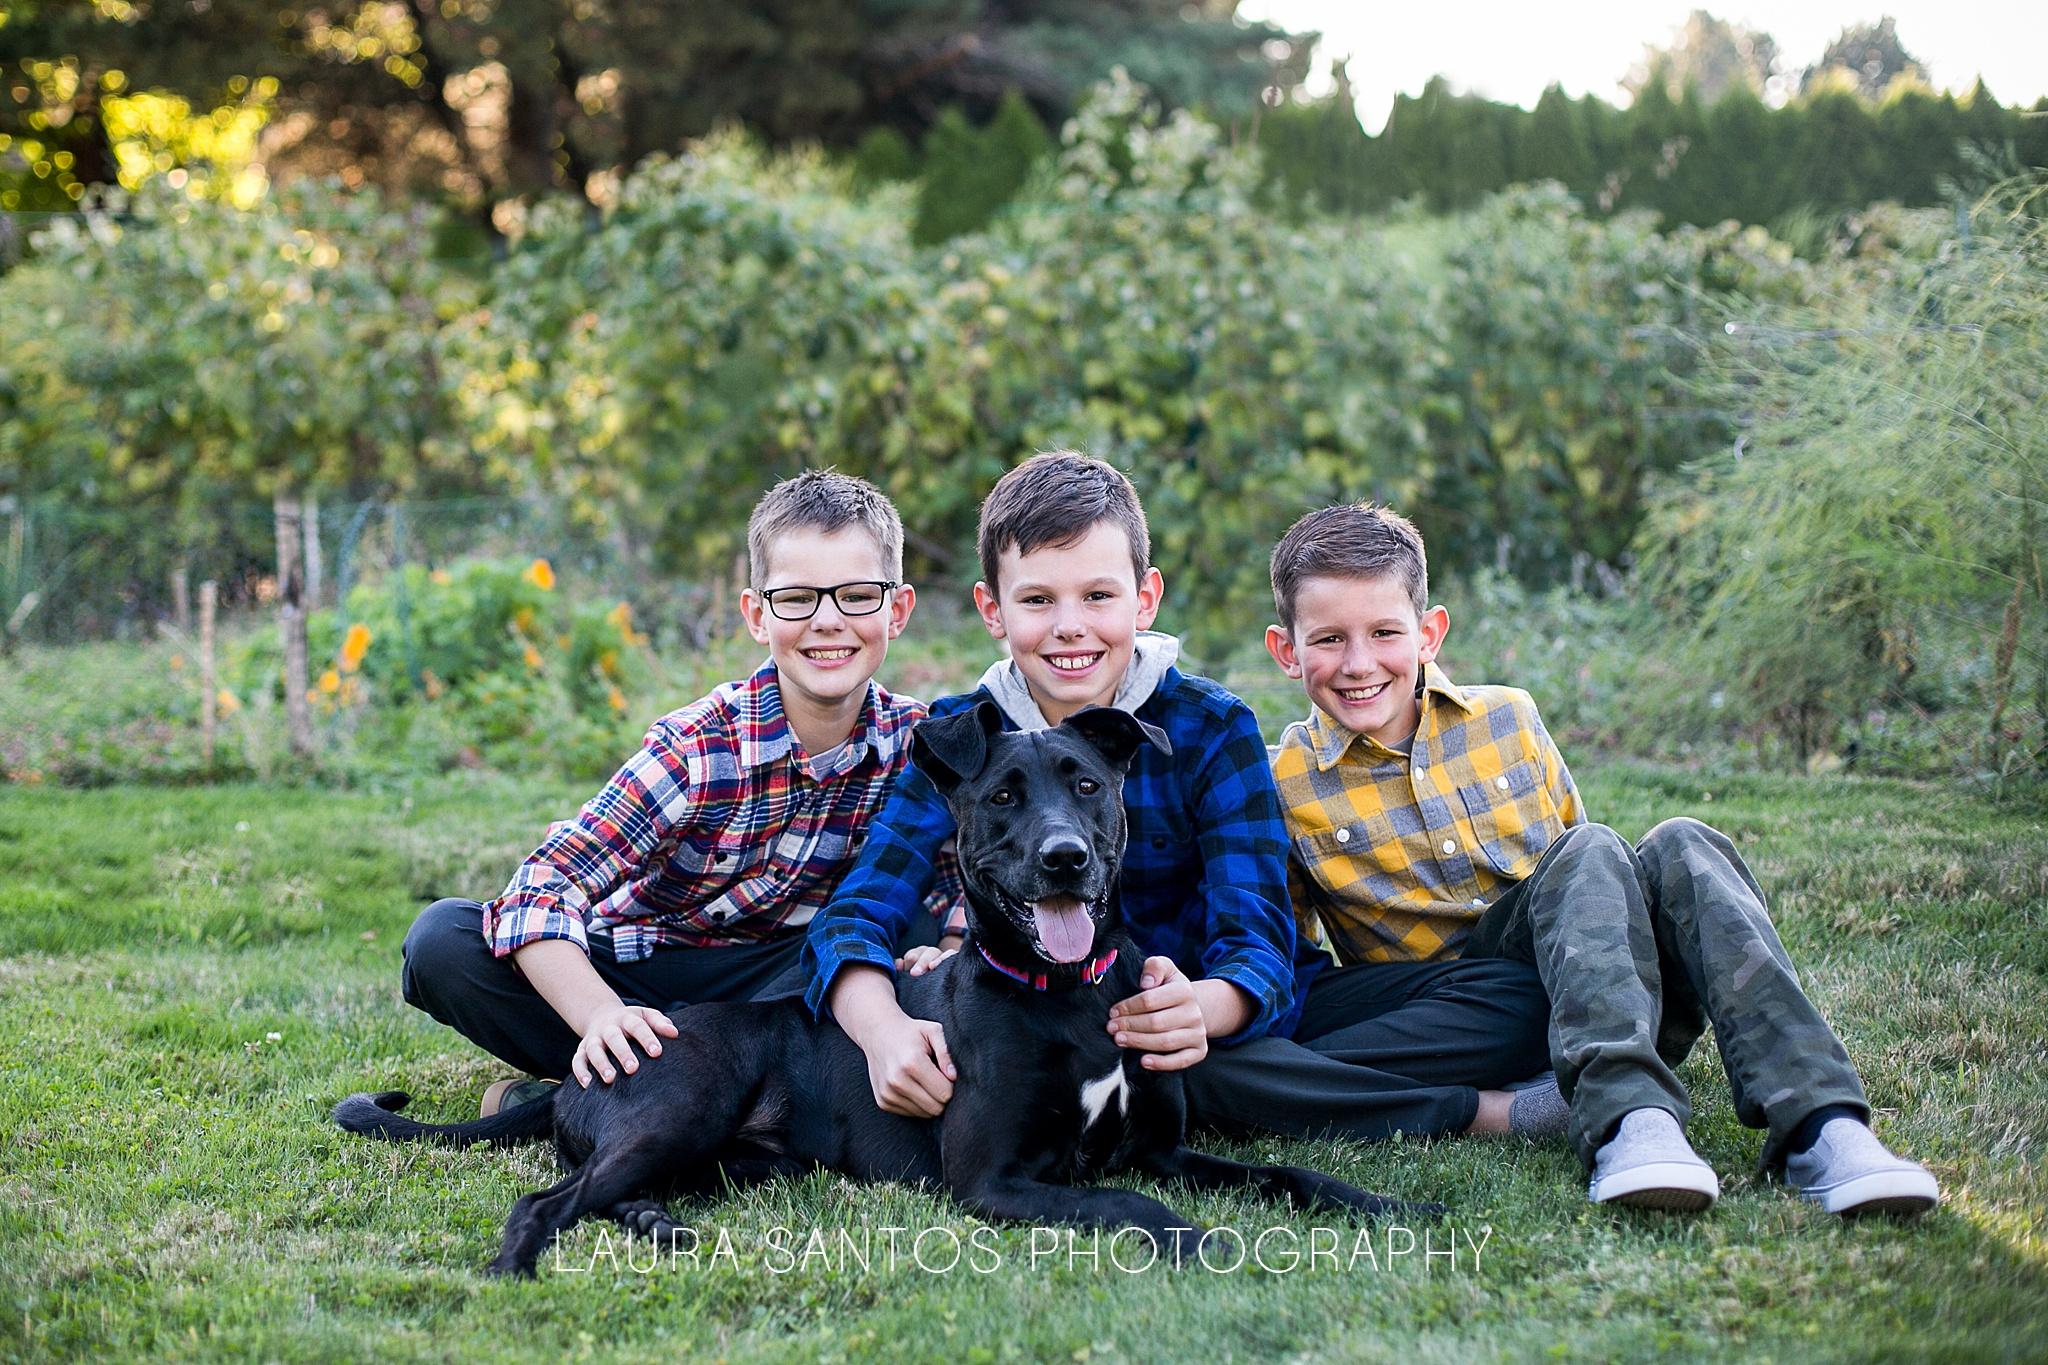 Laura Santos Photography Portland Oregon Family Photographer_0715.jpg